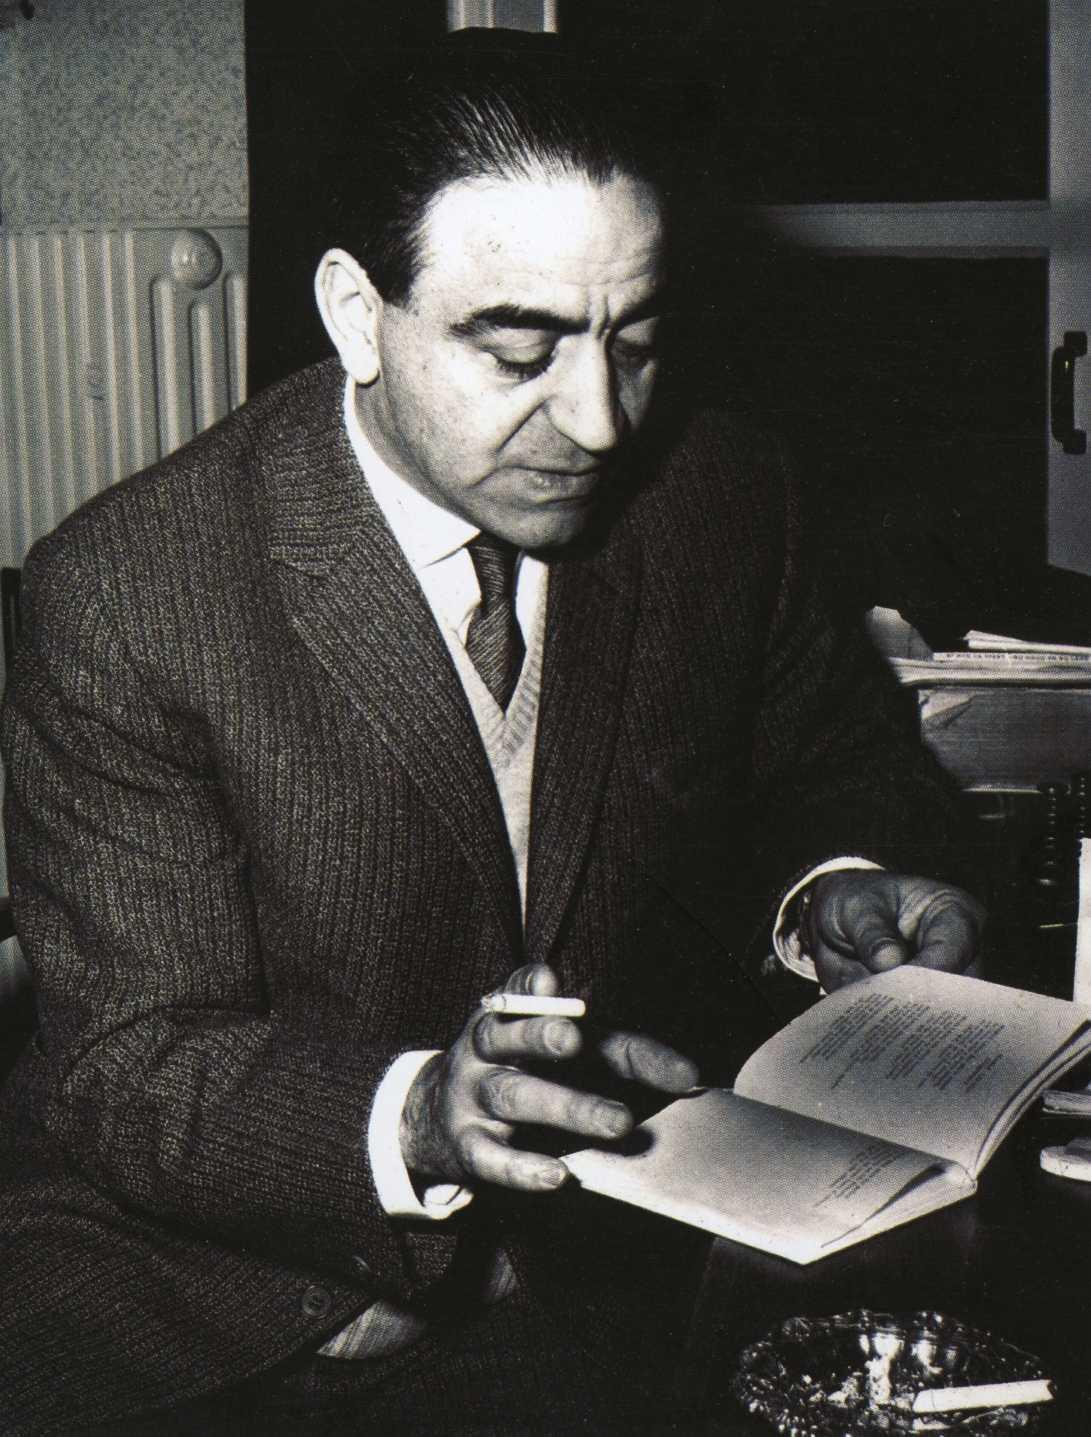 Francisco Carrasquer Launed